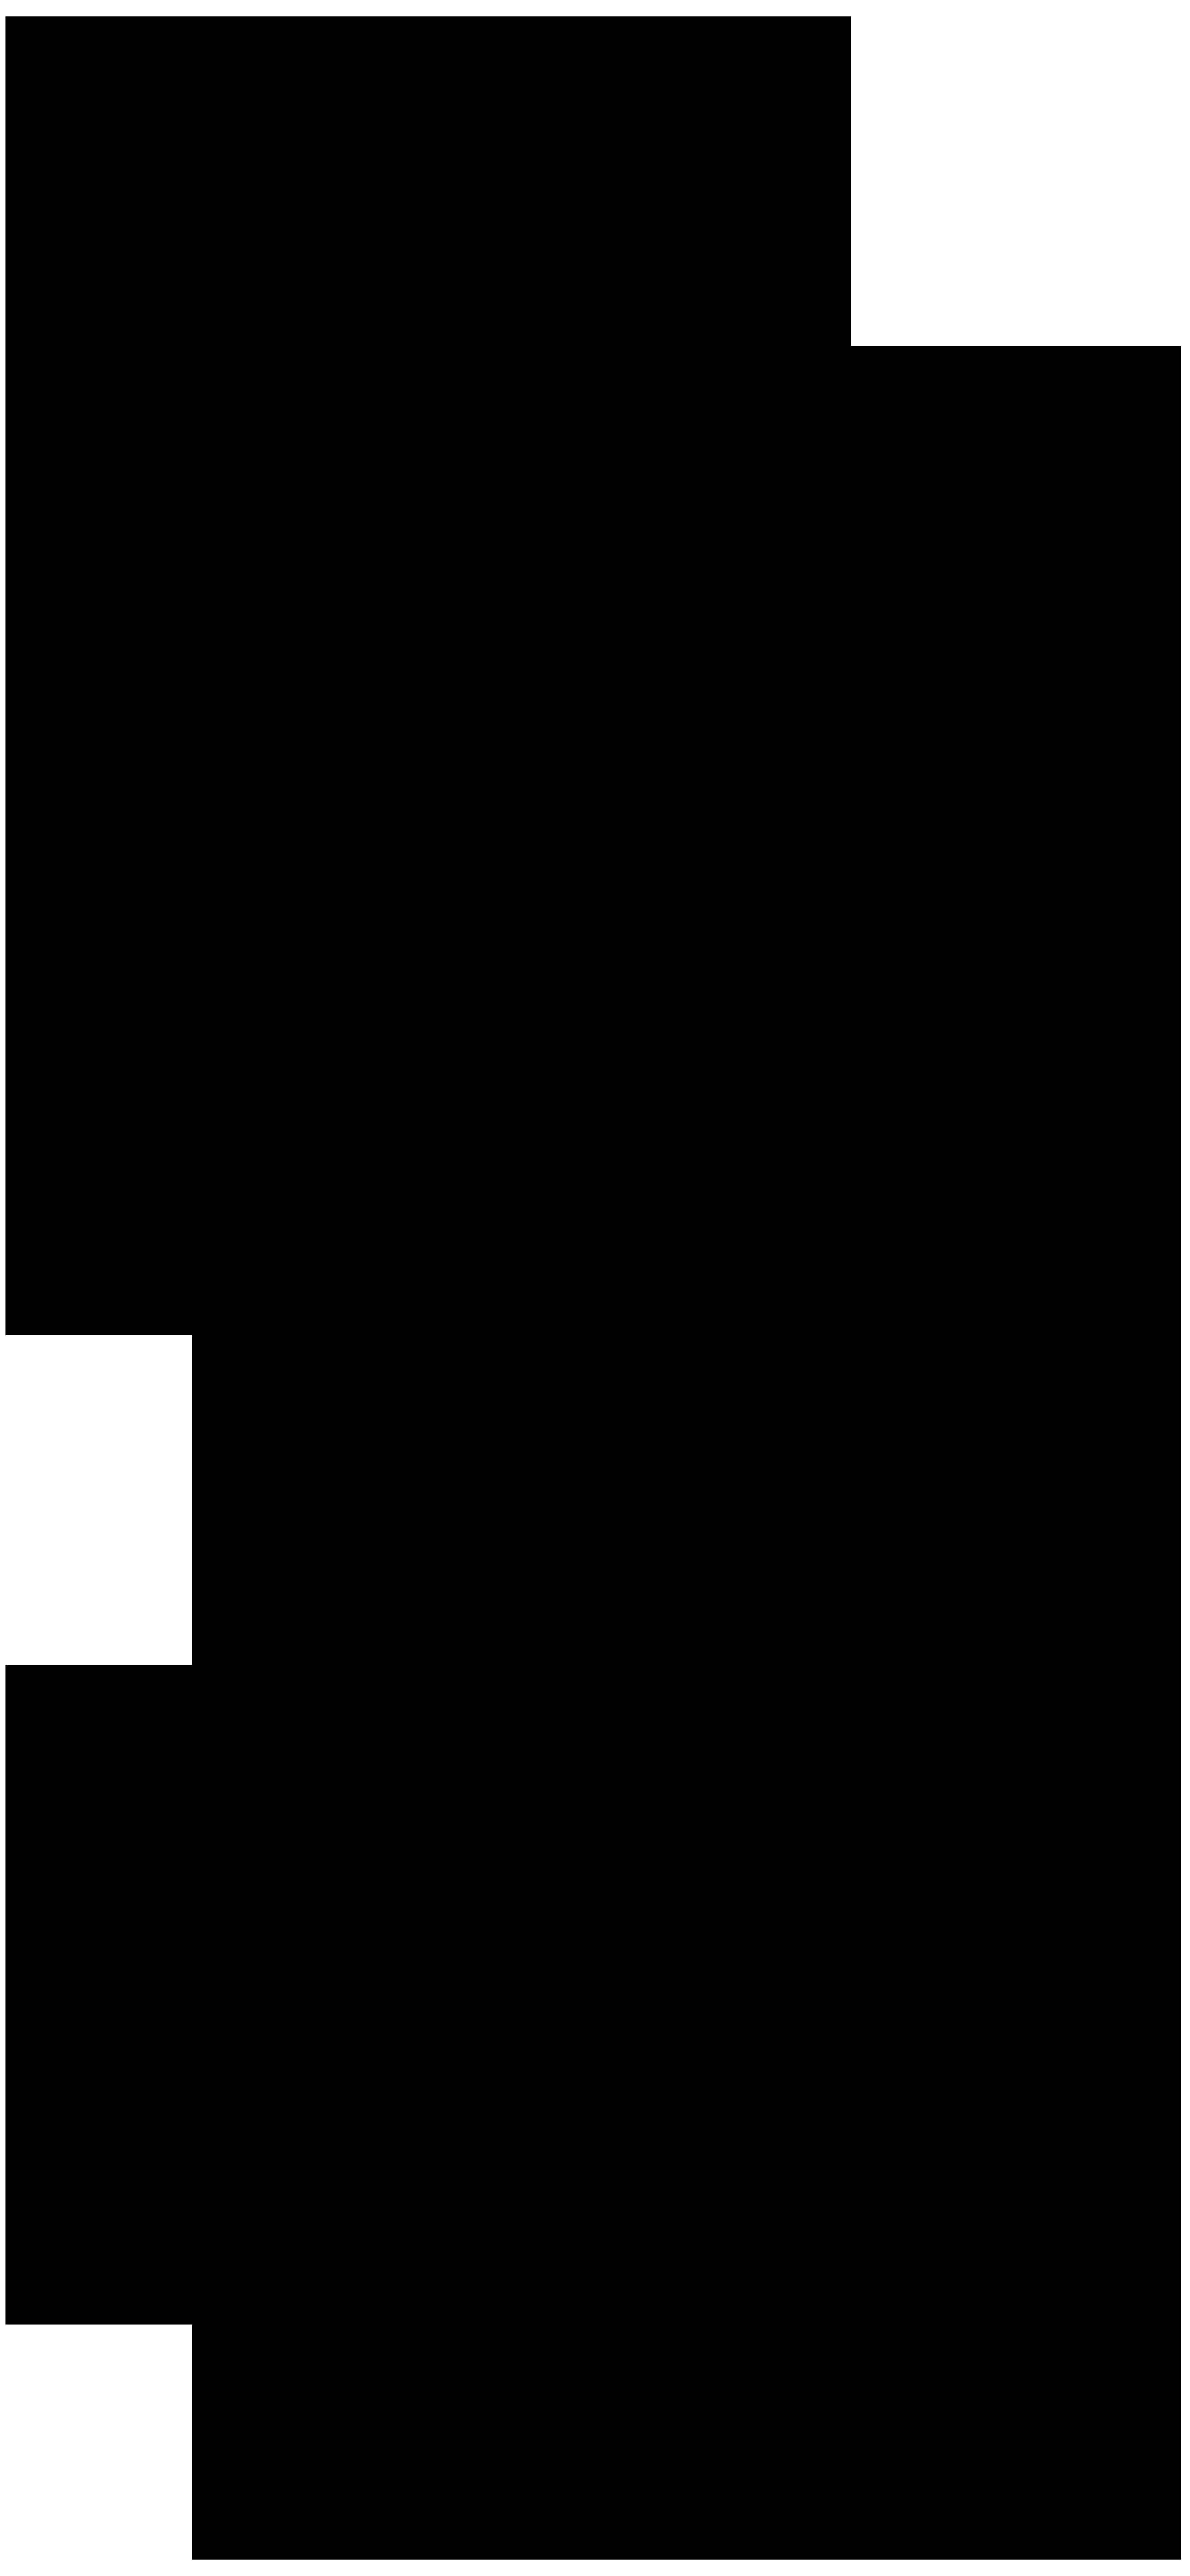 Bear Silhouette PNG Clip Art Image.